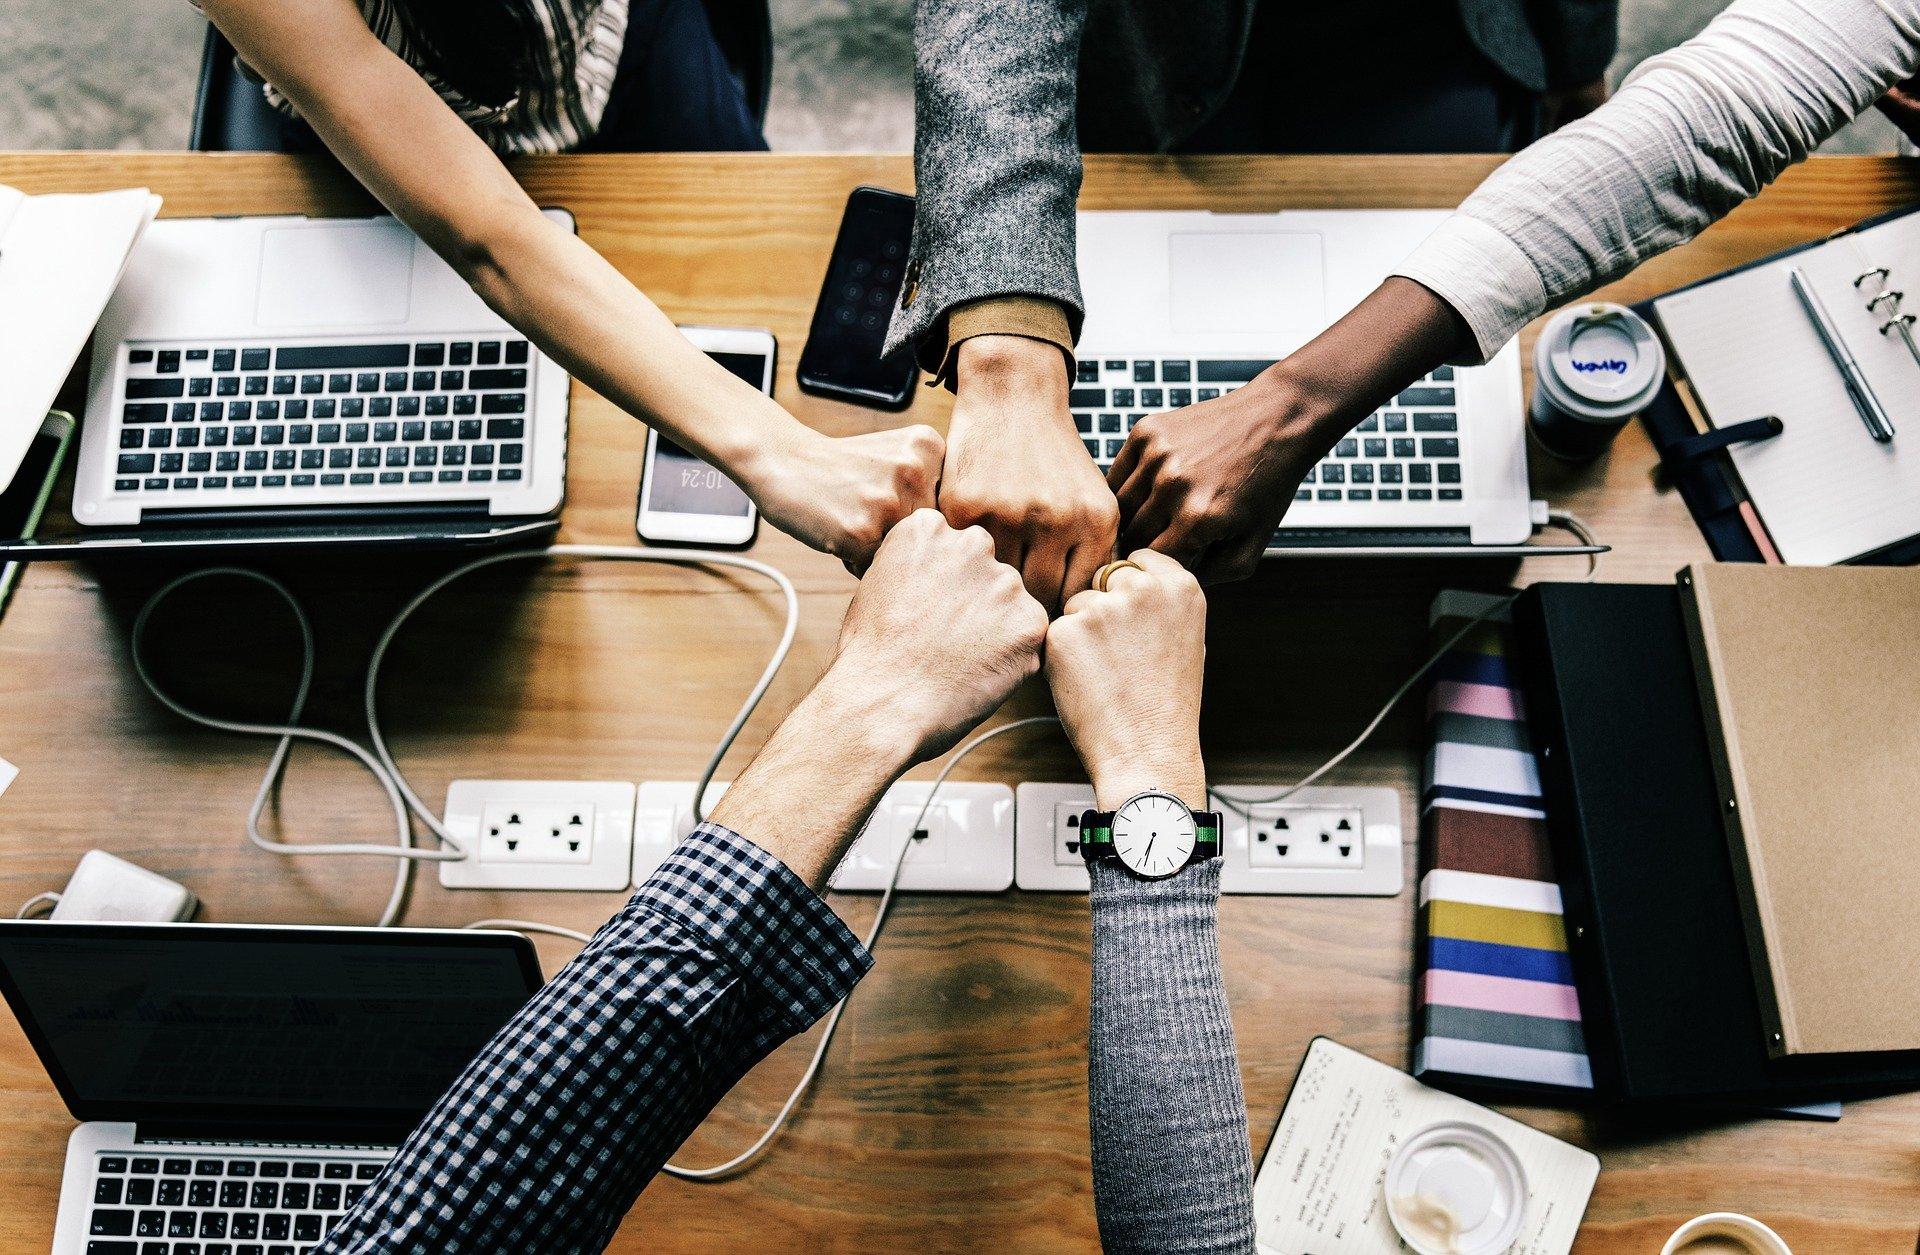 account-based-marketing-smarketing-team